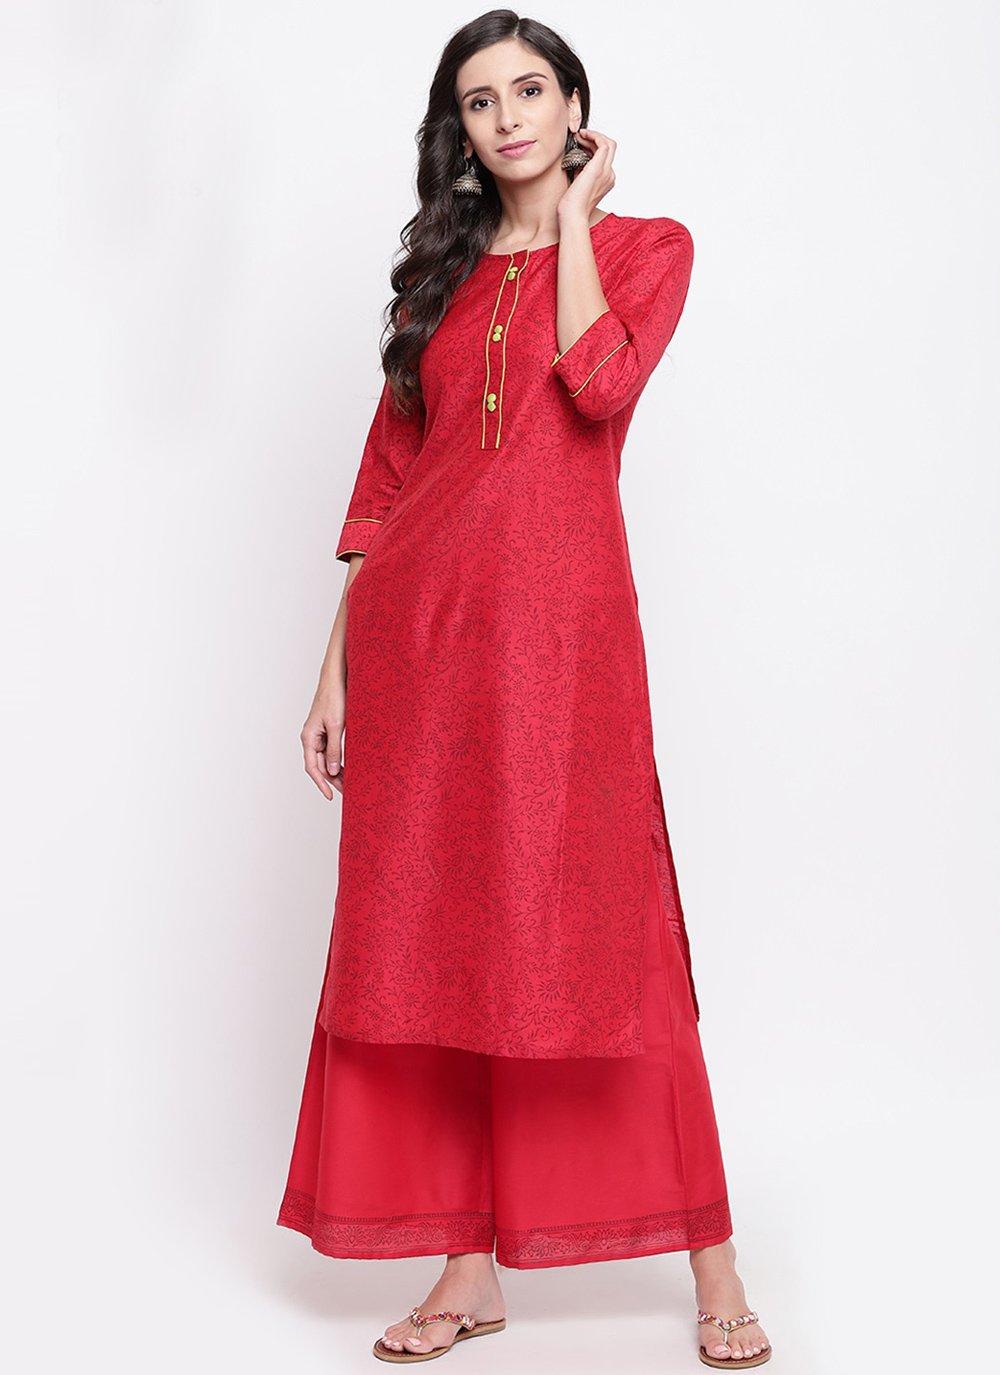 Chanderi Party Wear Kurti in Red